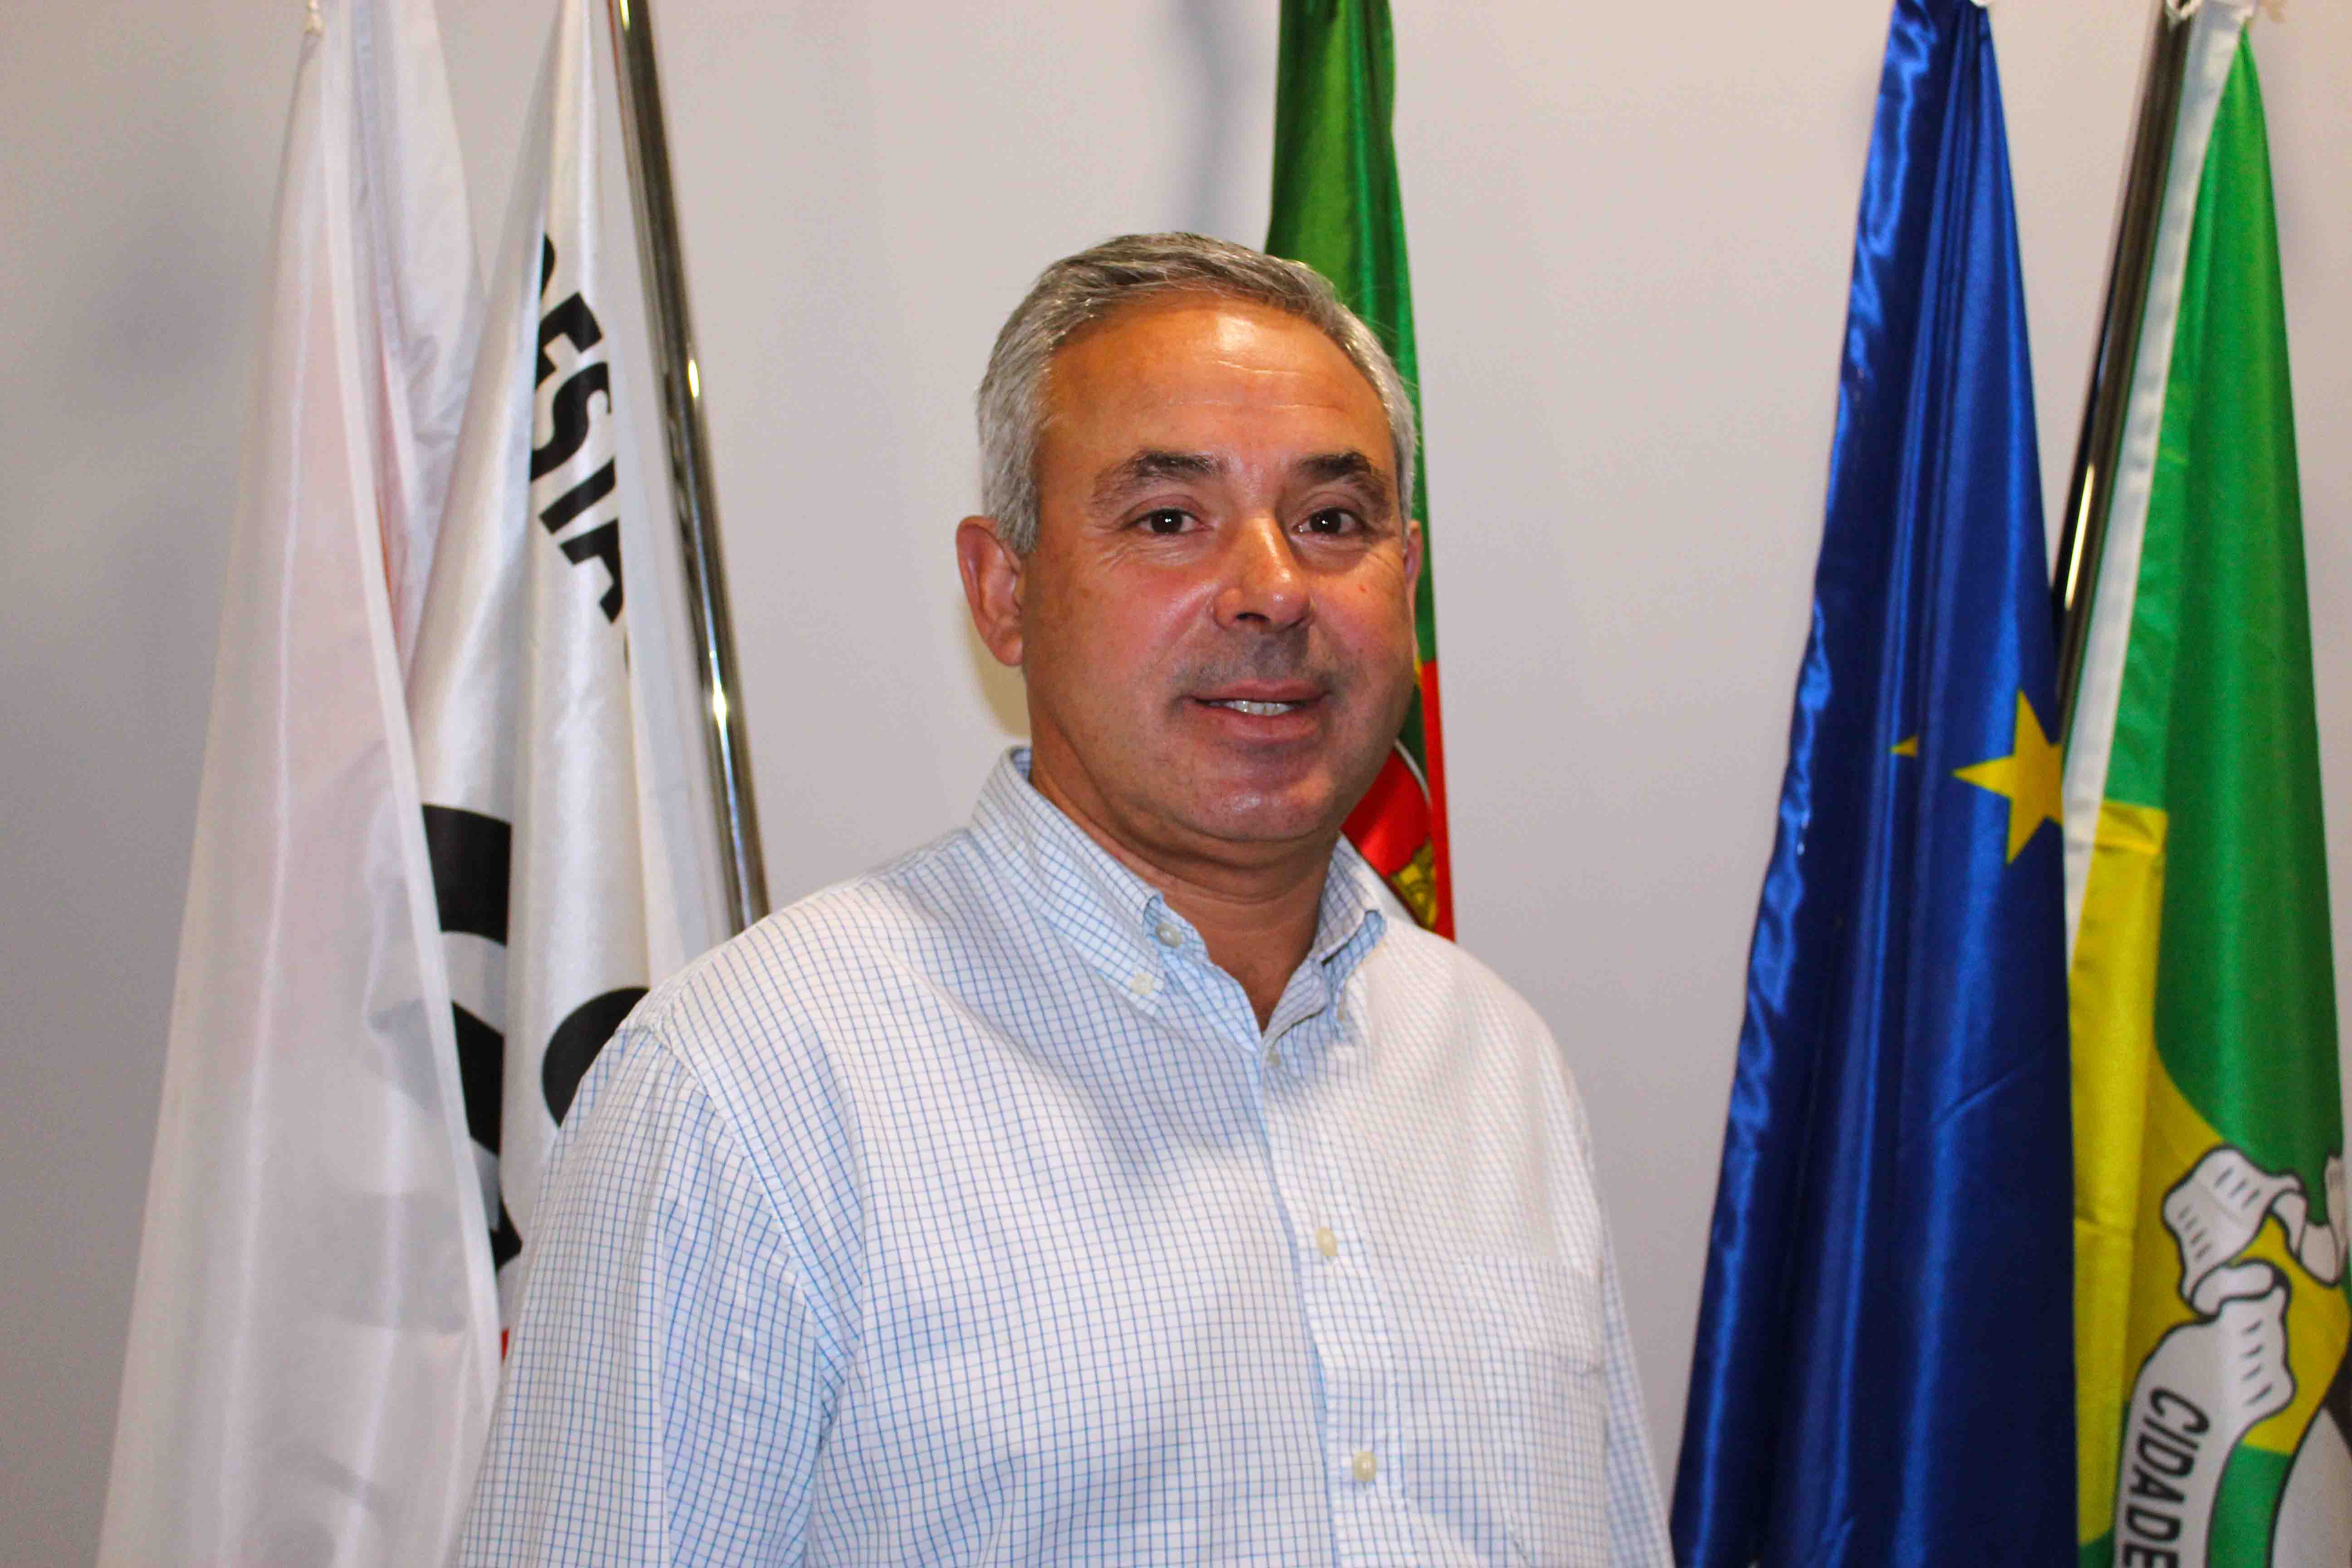 Clemente Santos